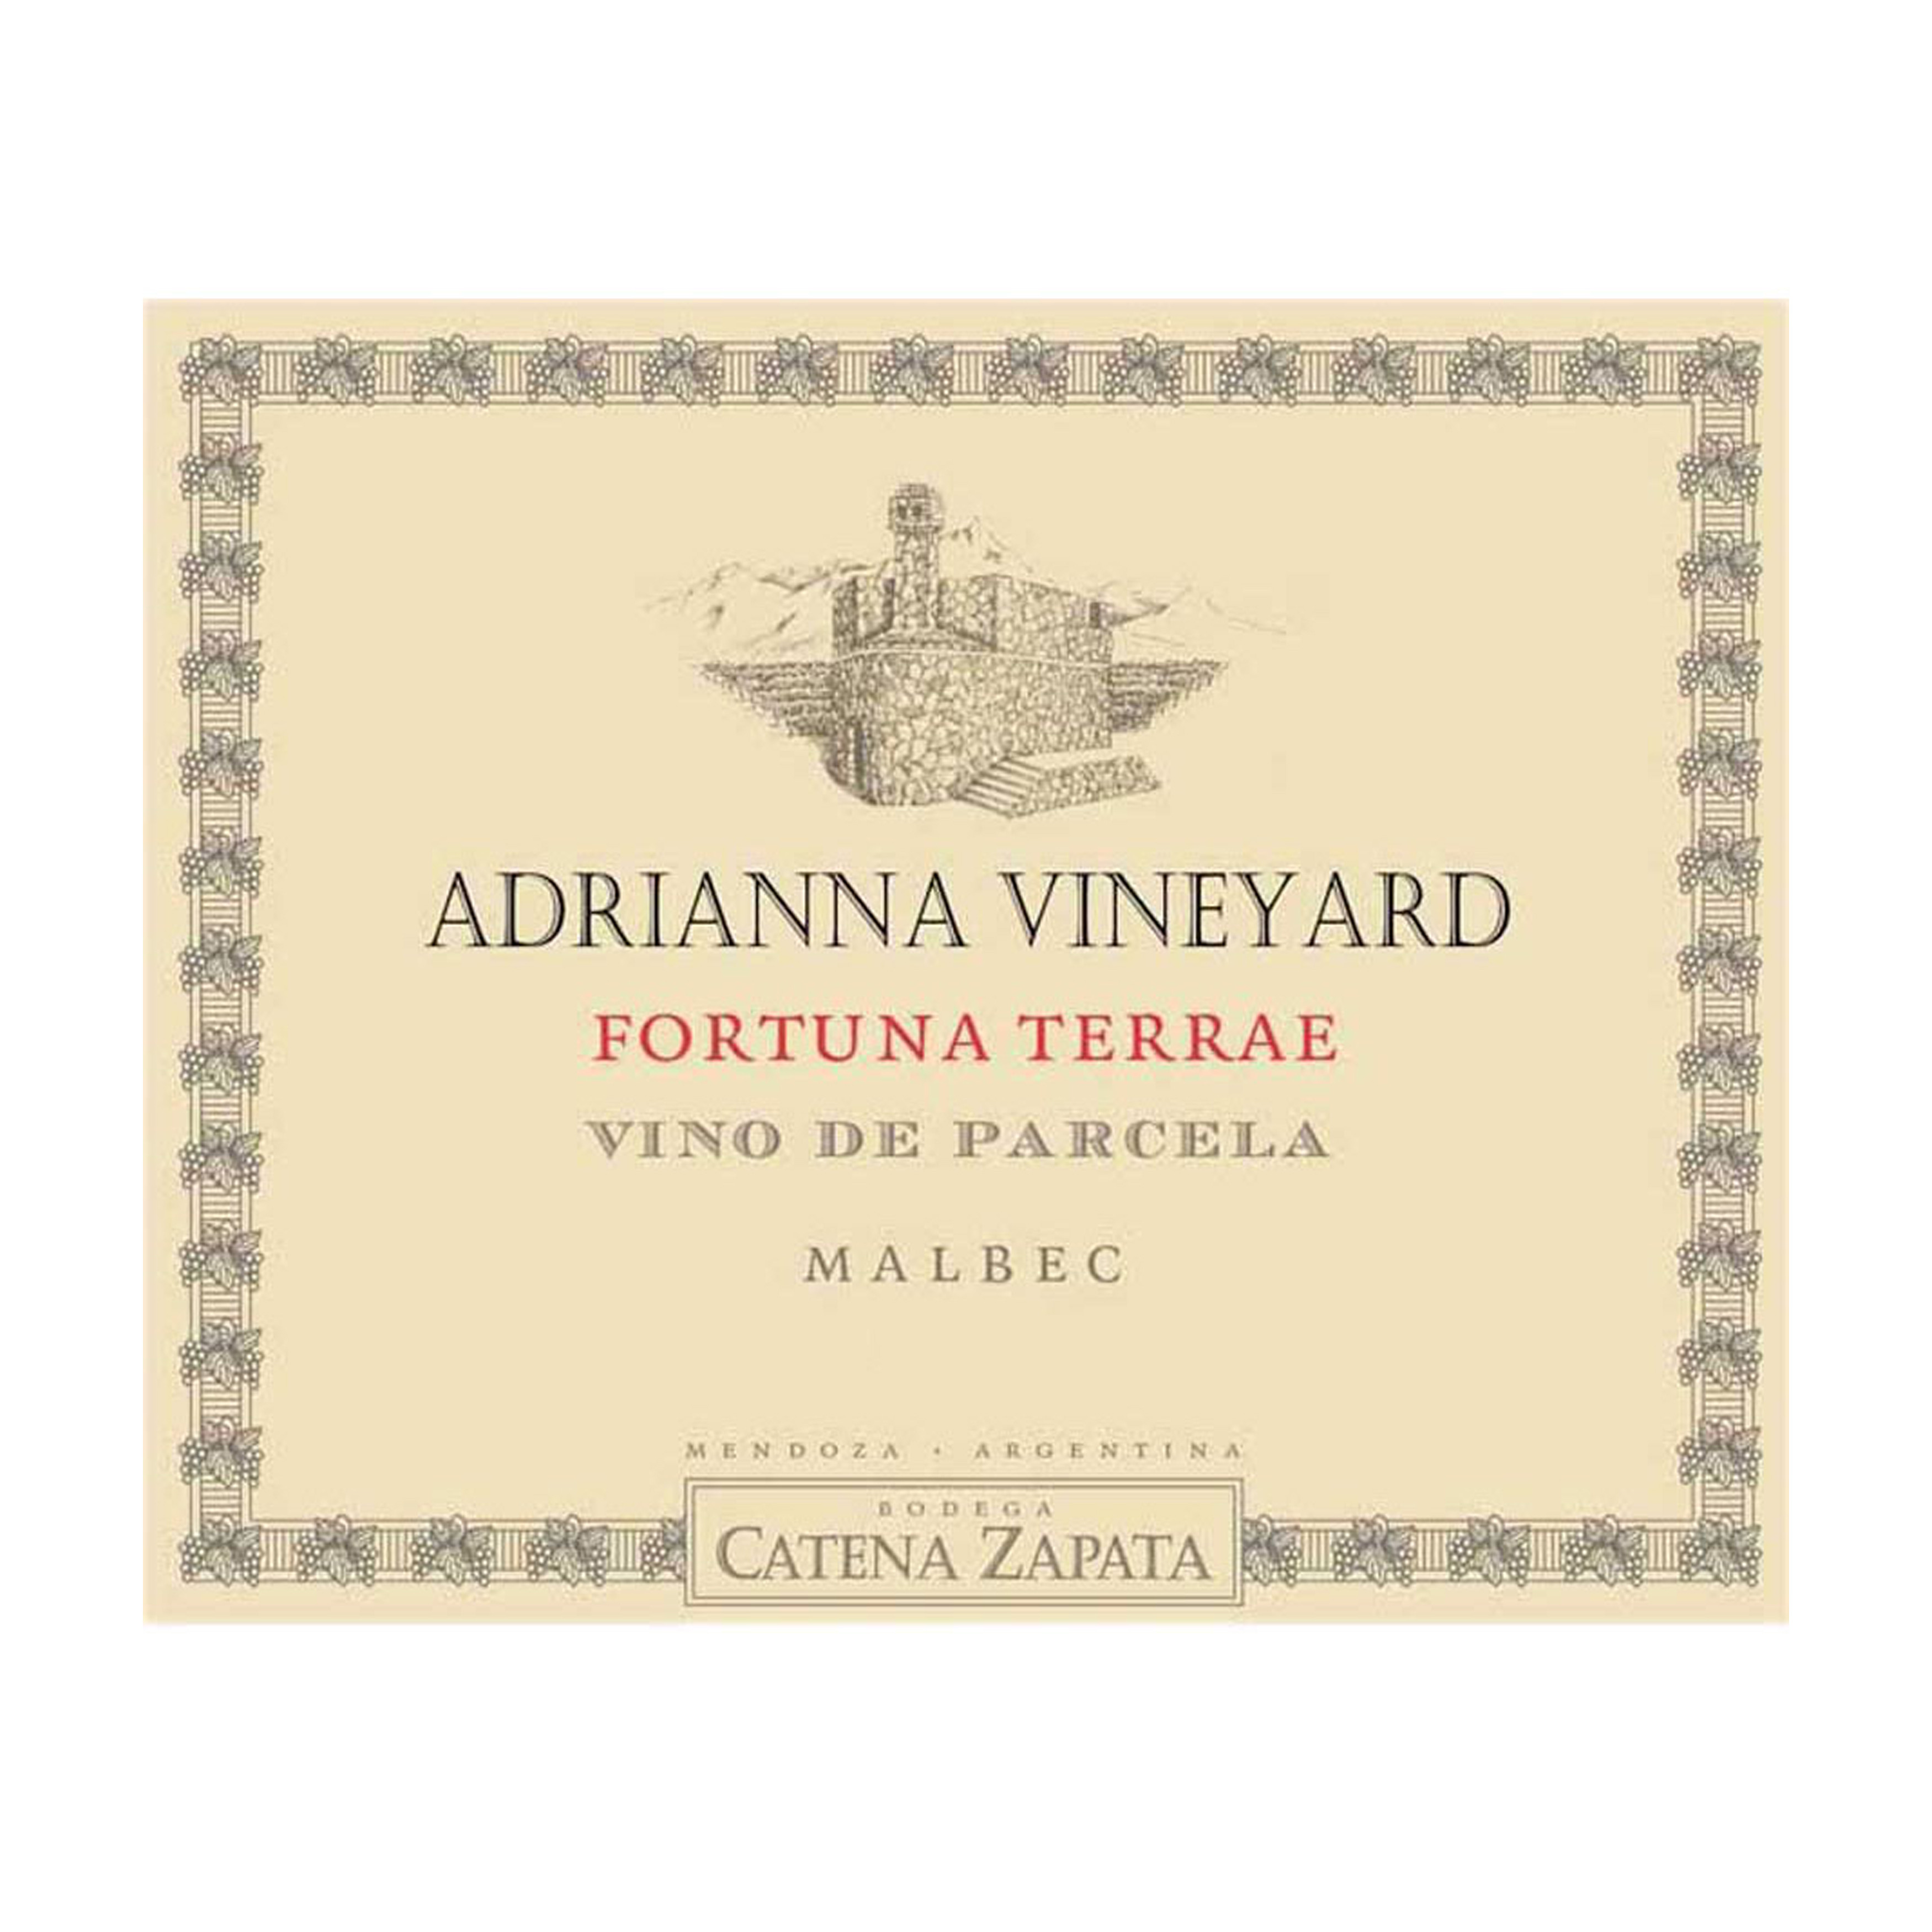 Catena Zapata Adrianna Vineyard Fortuna Terrae Malbec 2012 (3x75cl)